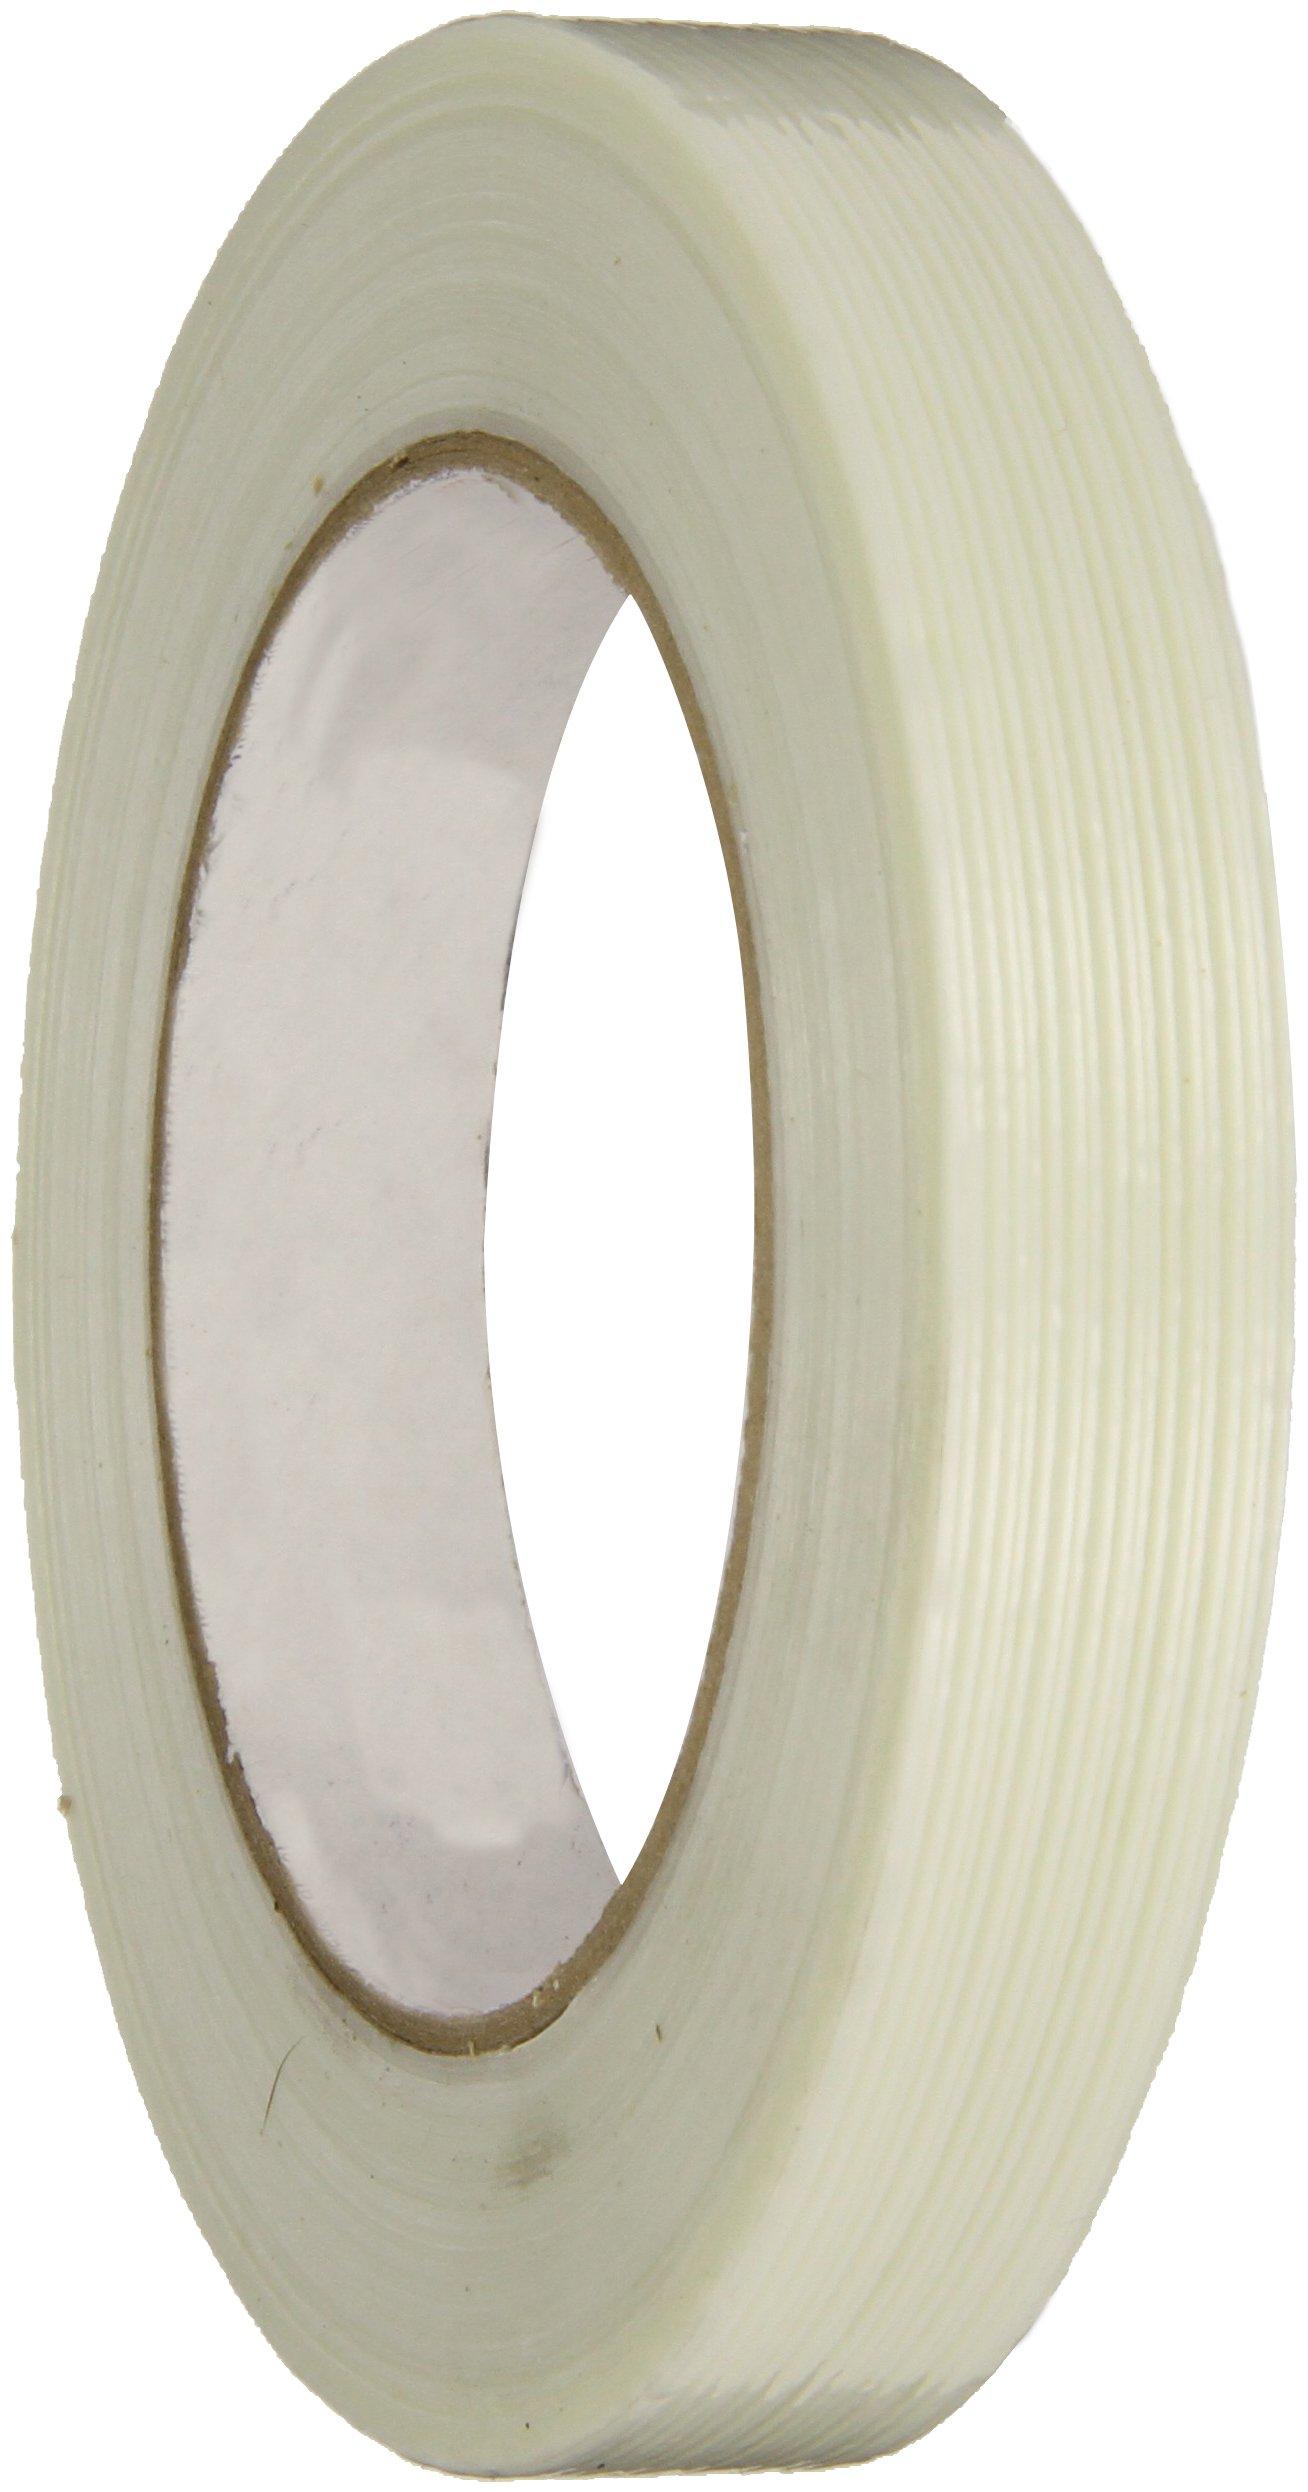 Intertape Polymer Group RG303 130 lbs/in Fiberglass Reinforced BOPP Backed Filament Tape,  18mm x 54.8M, Case of 48 Rolls